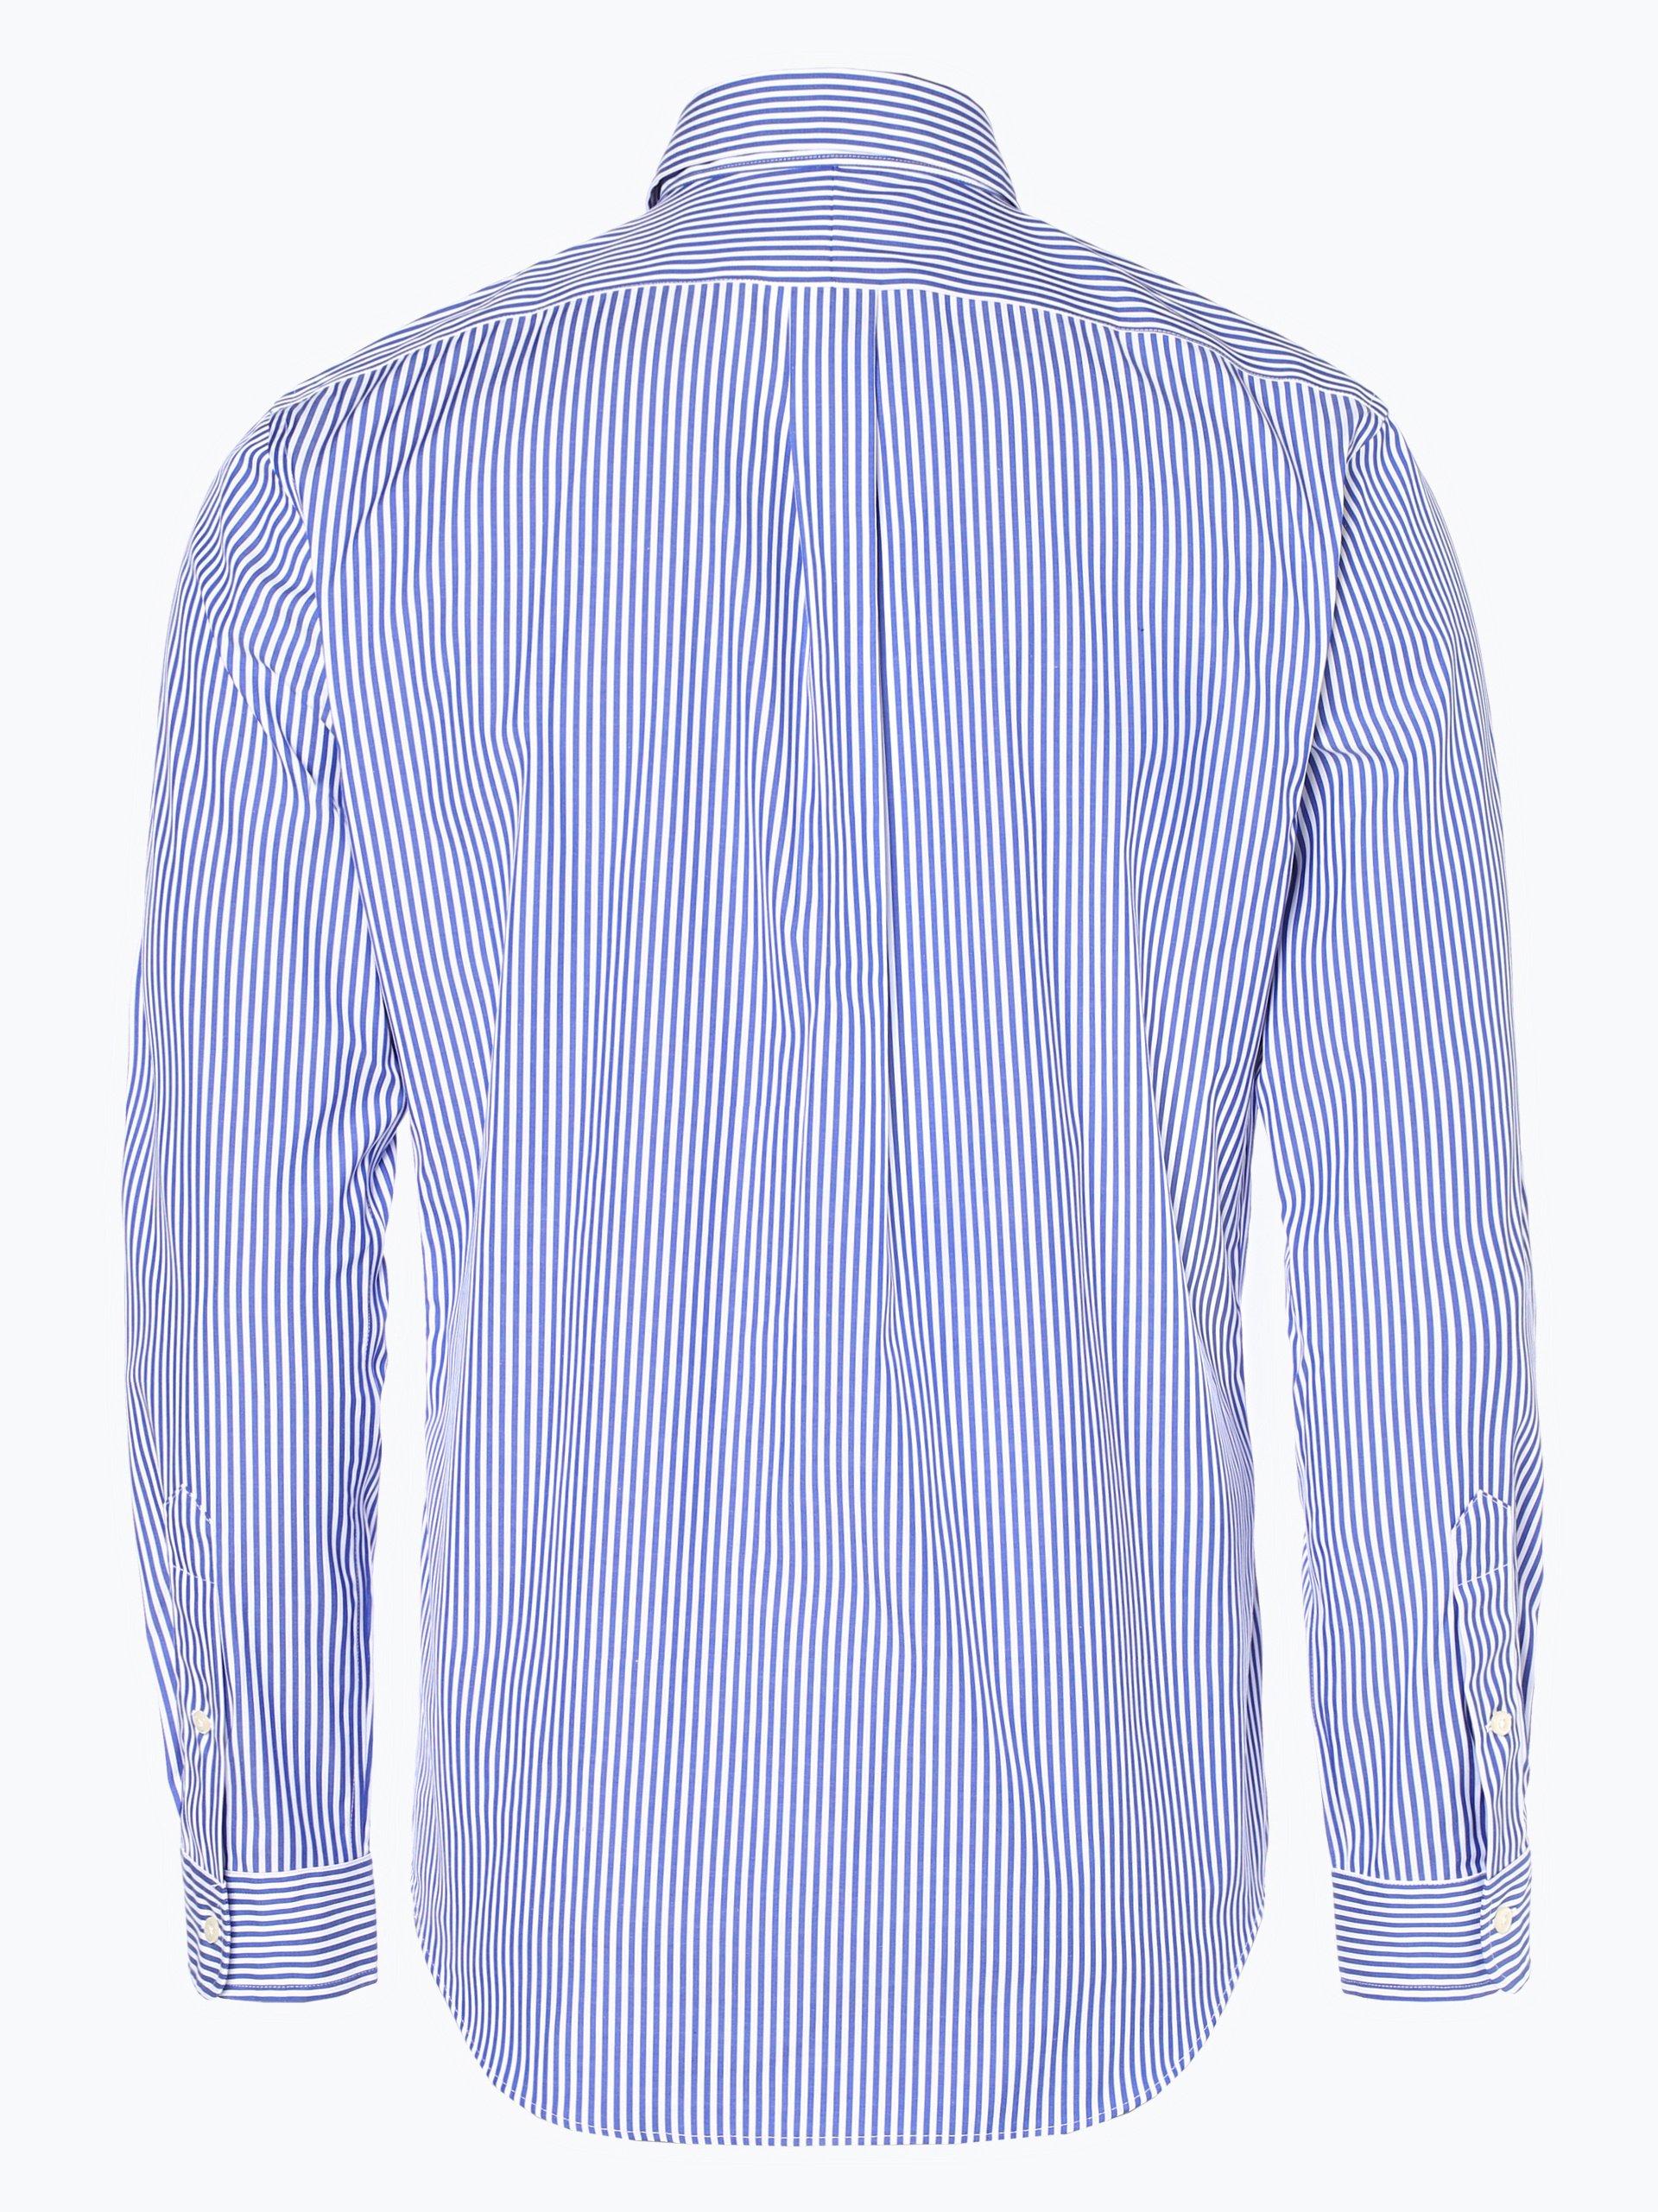 polo ralph lauren herren hemd b gelleicht blau gestreift online kaufen vangraaf com. Black Bedroom Furniture Sets. Home Design Ideas